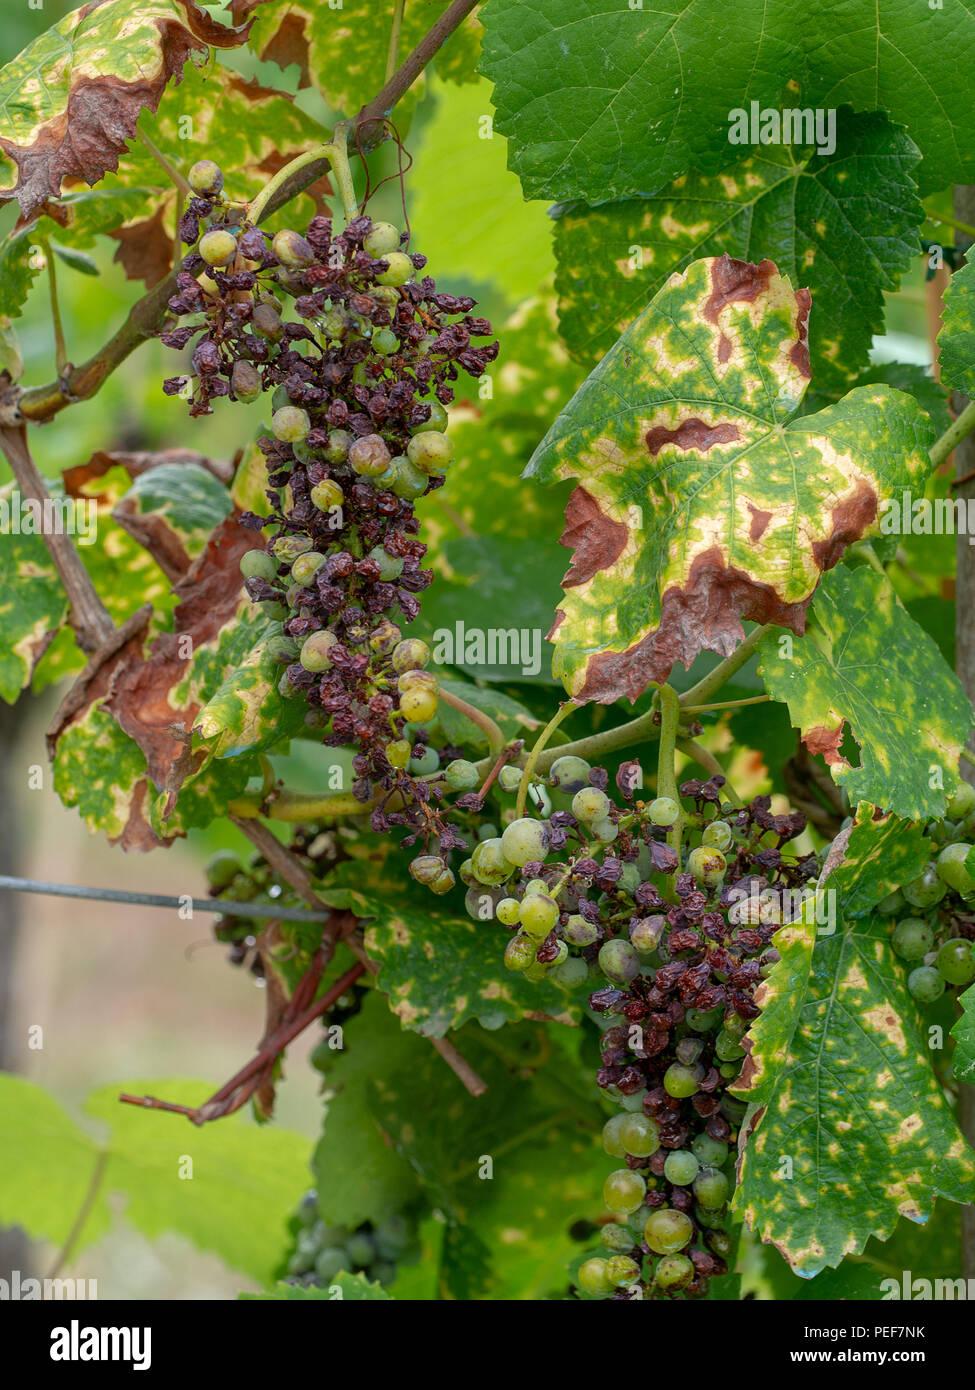 Grape pathology, Black Rot on grapevine and fruit caused by an ascomycetous fungus, Guignardia bidwelli. - Stock Image